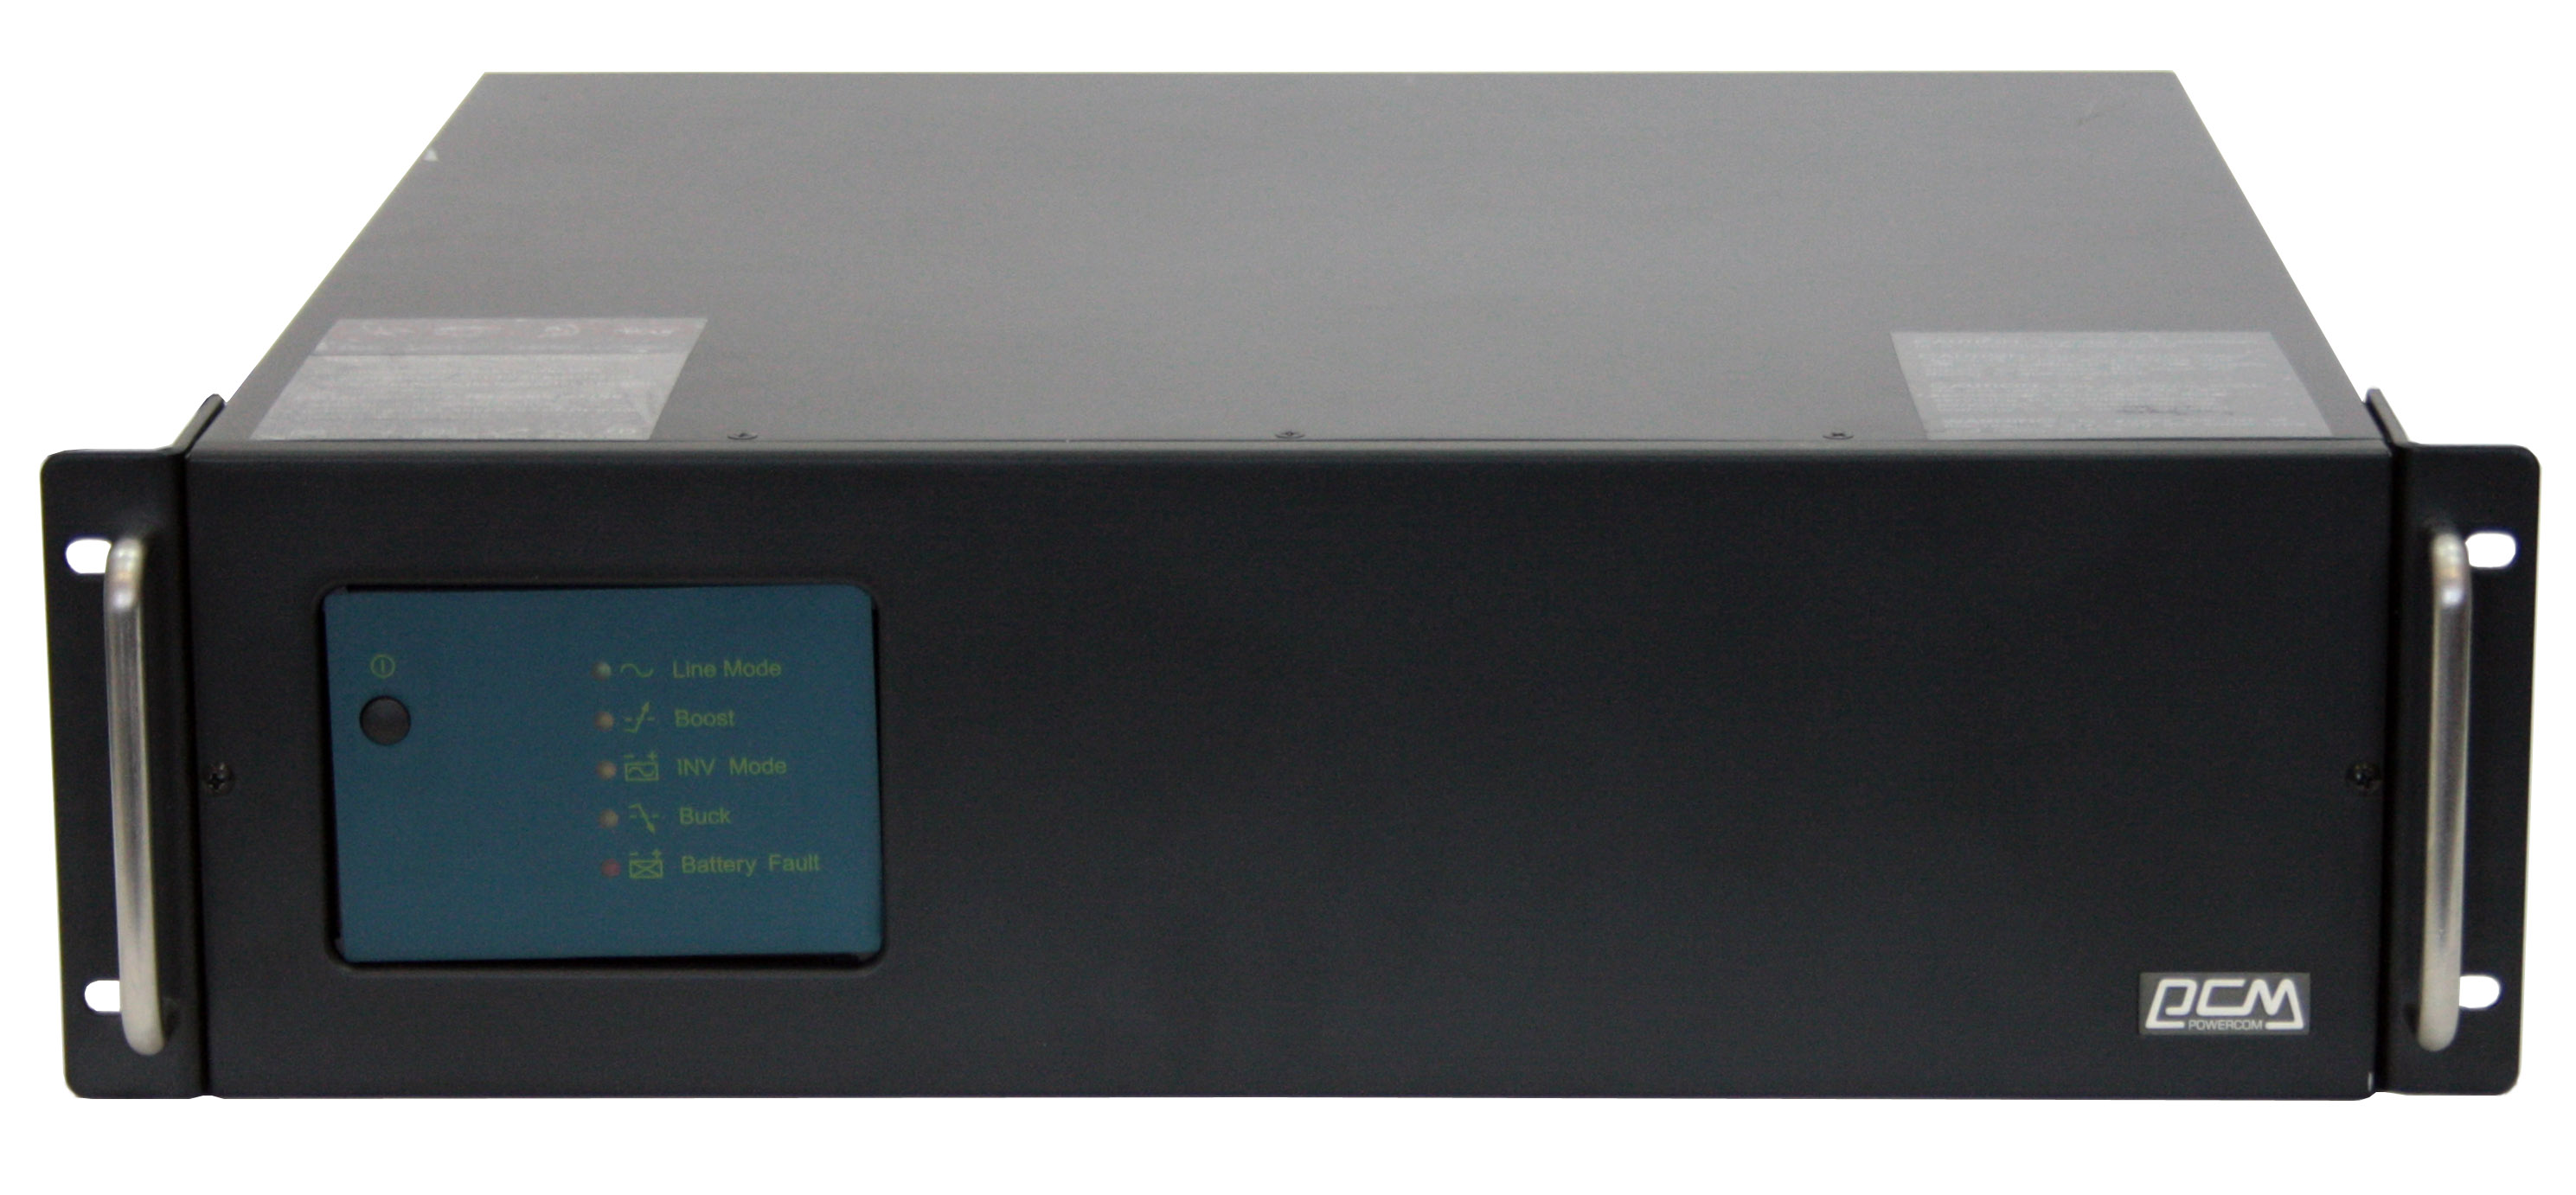 ИБП Powercom KIN-3000AP RM 3000VA/1800W 3U,USB,RS-232 (8 x IEC)